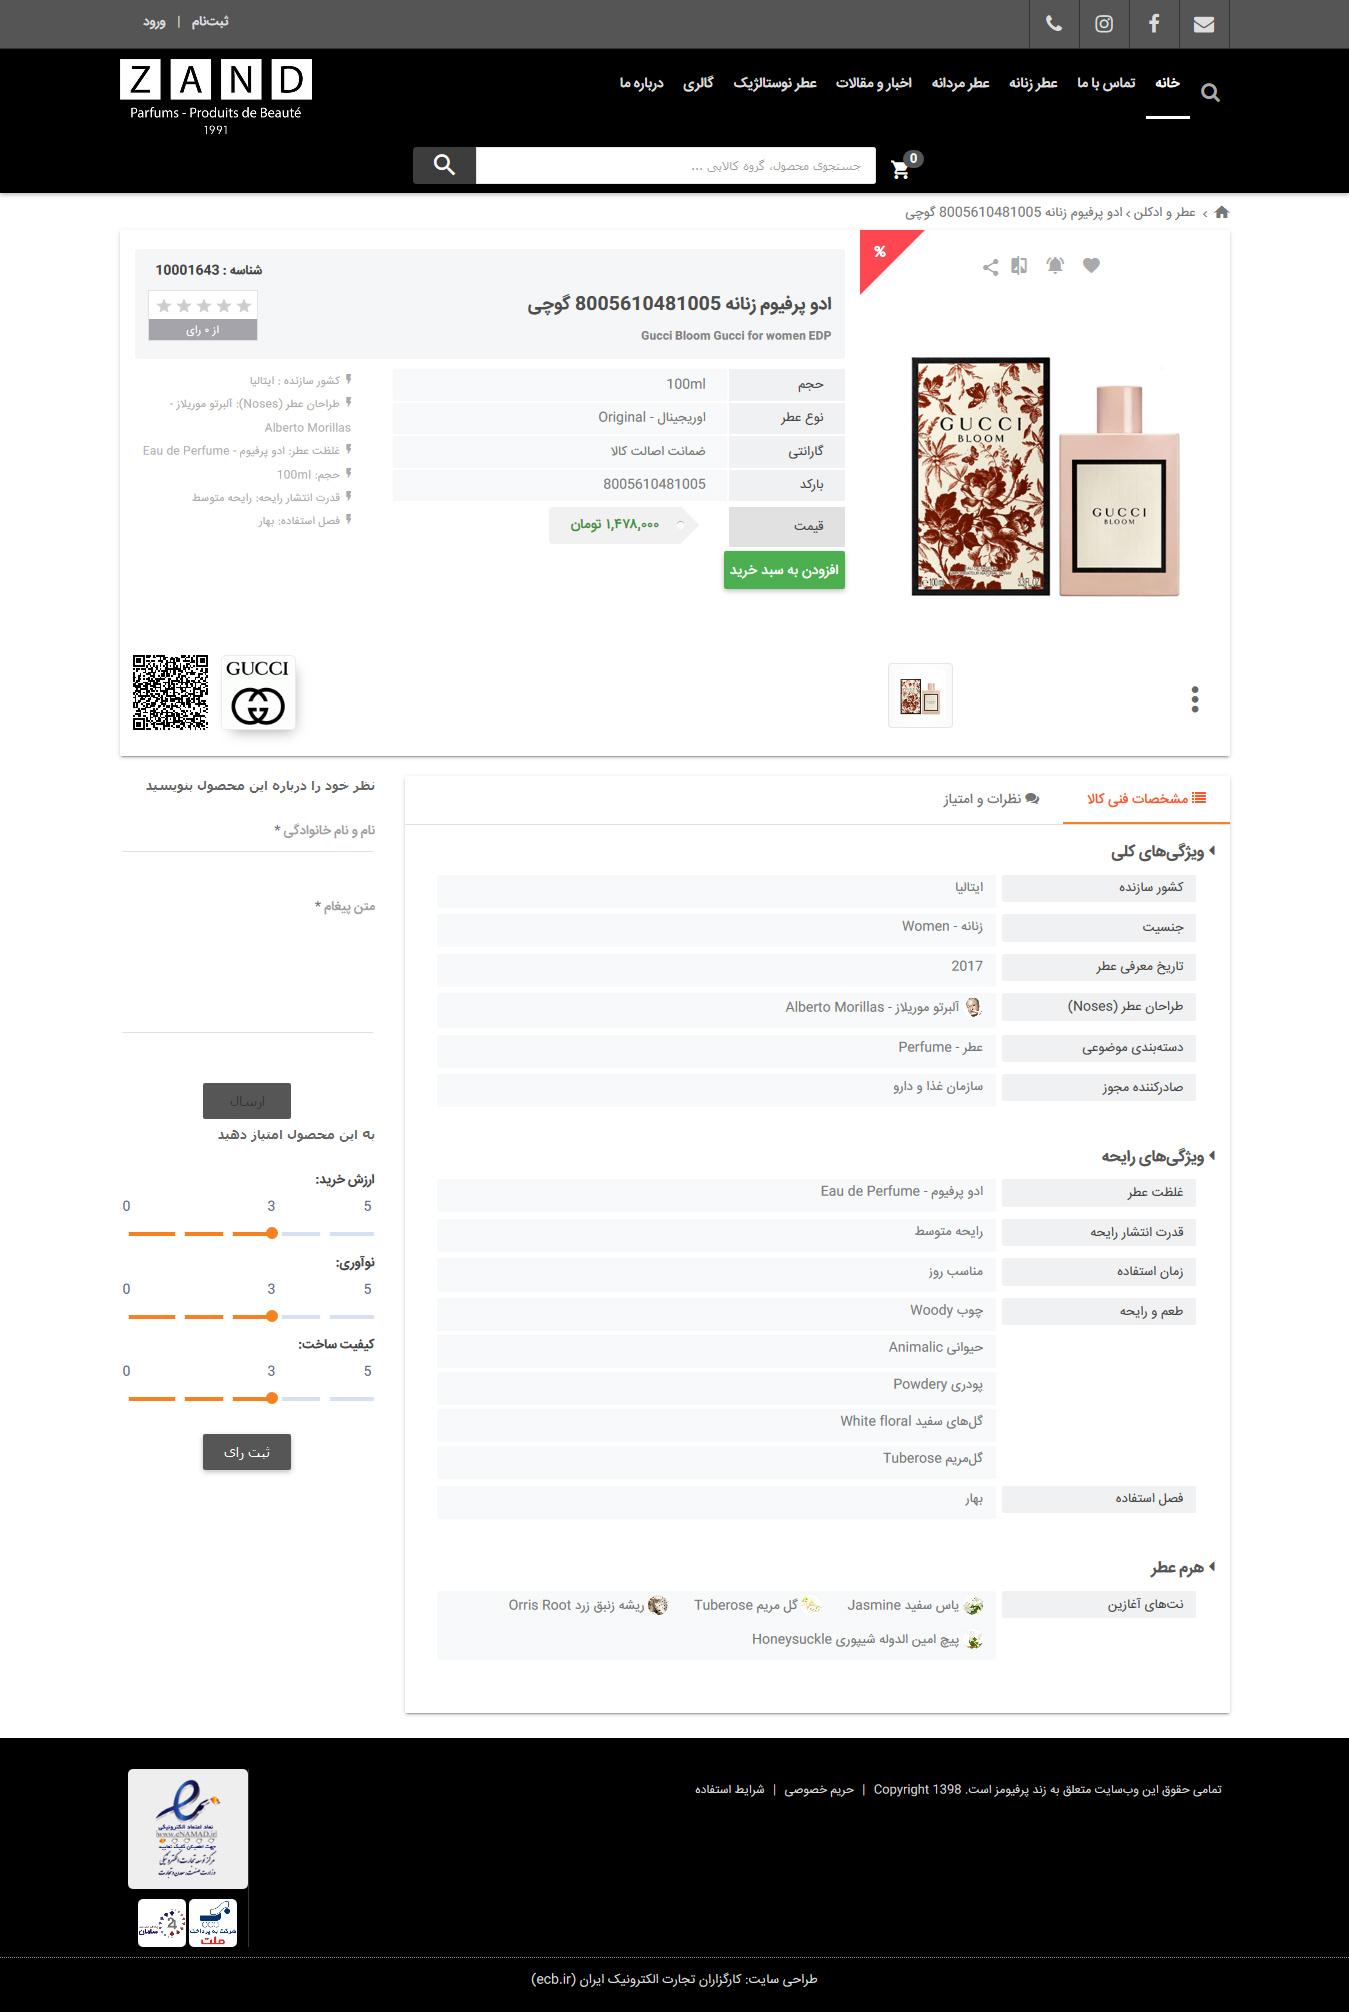 zandperfumes-Product-Details